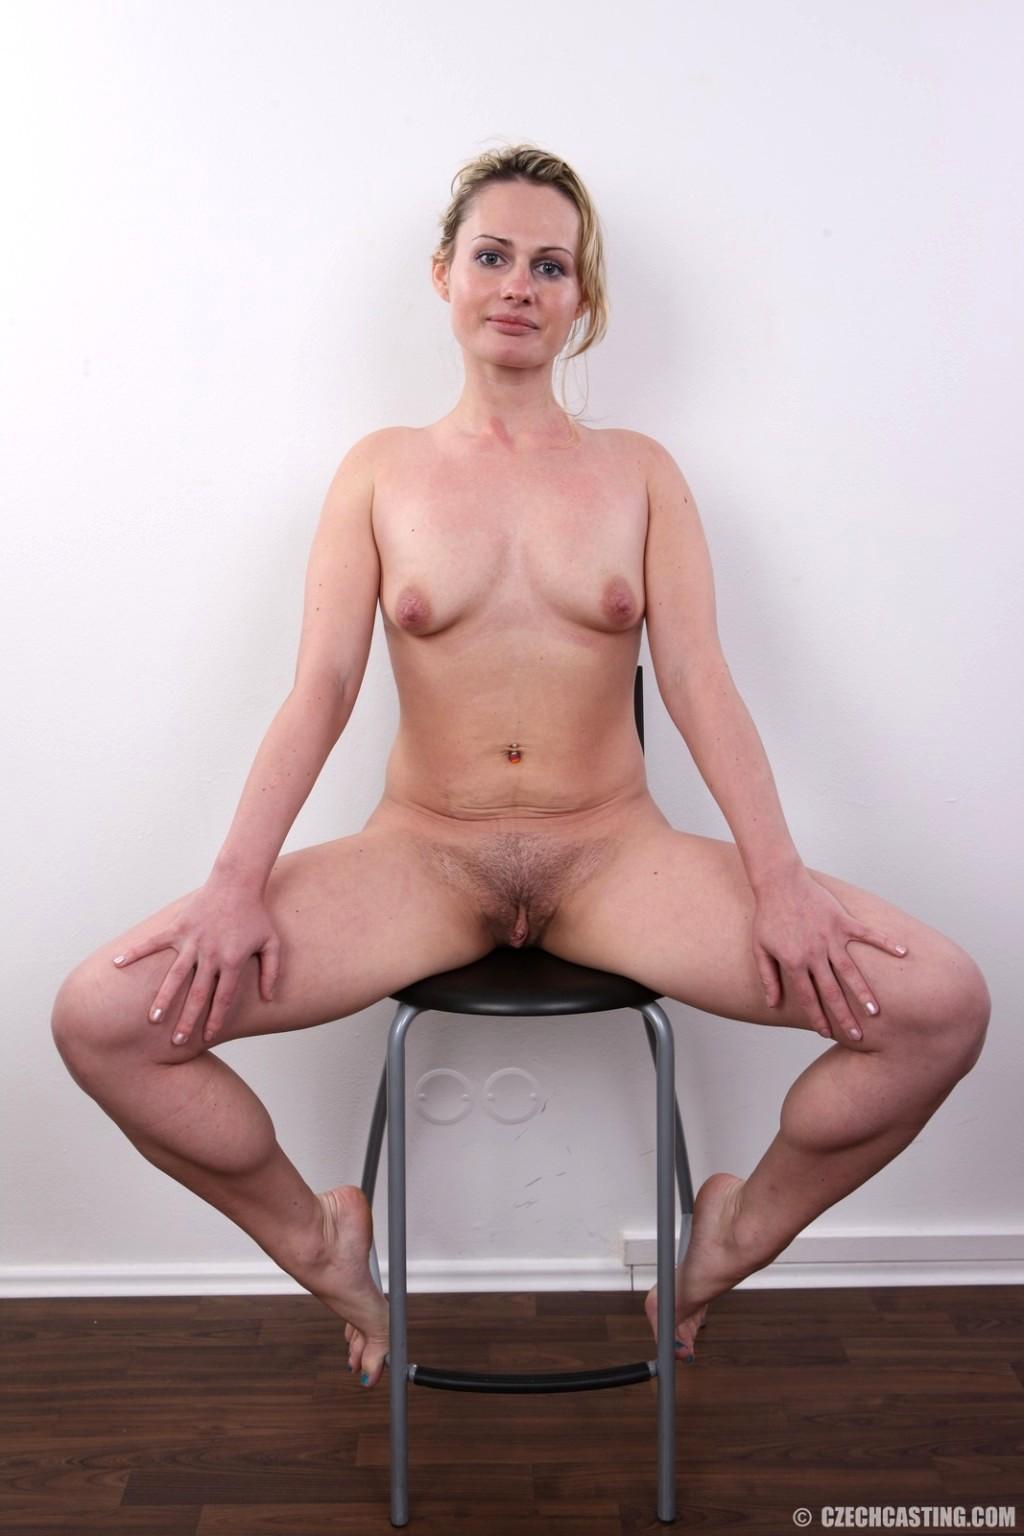 Czech Casting Czechcasting Model Tonight Mature Web Sex Hd -9524